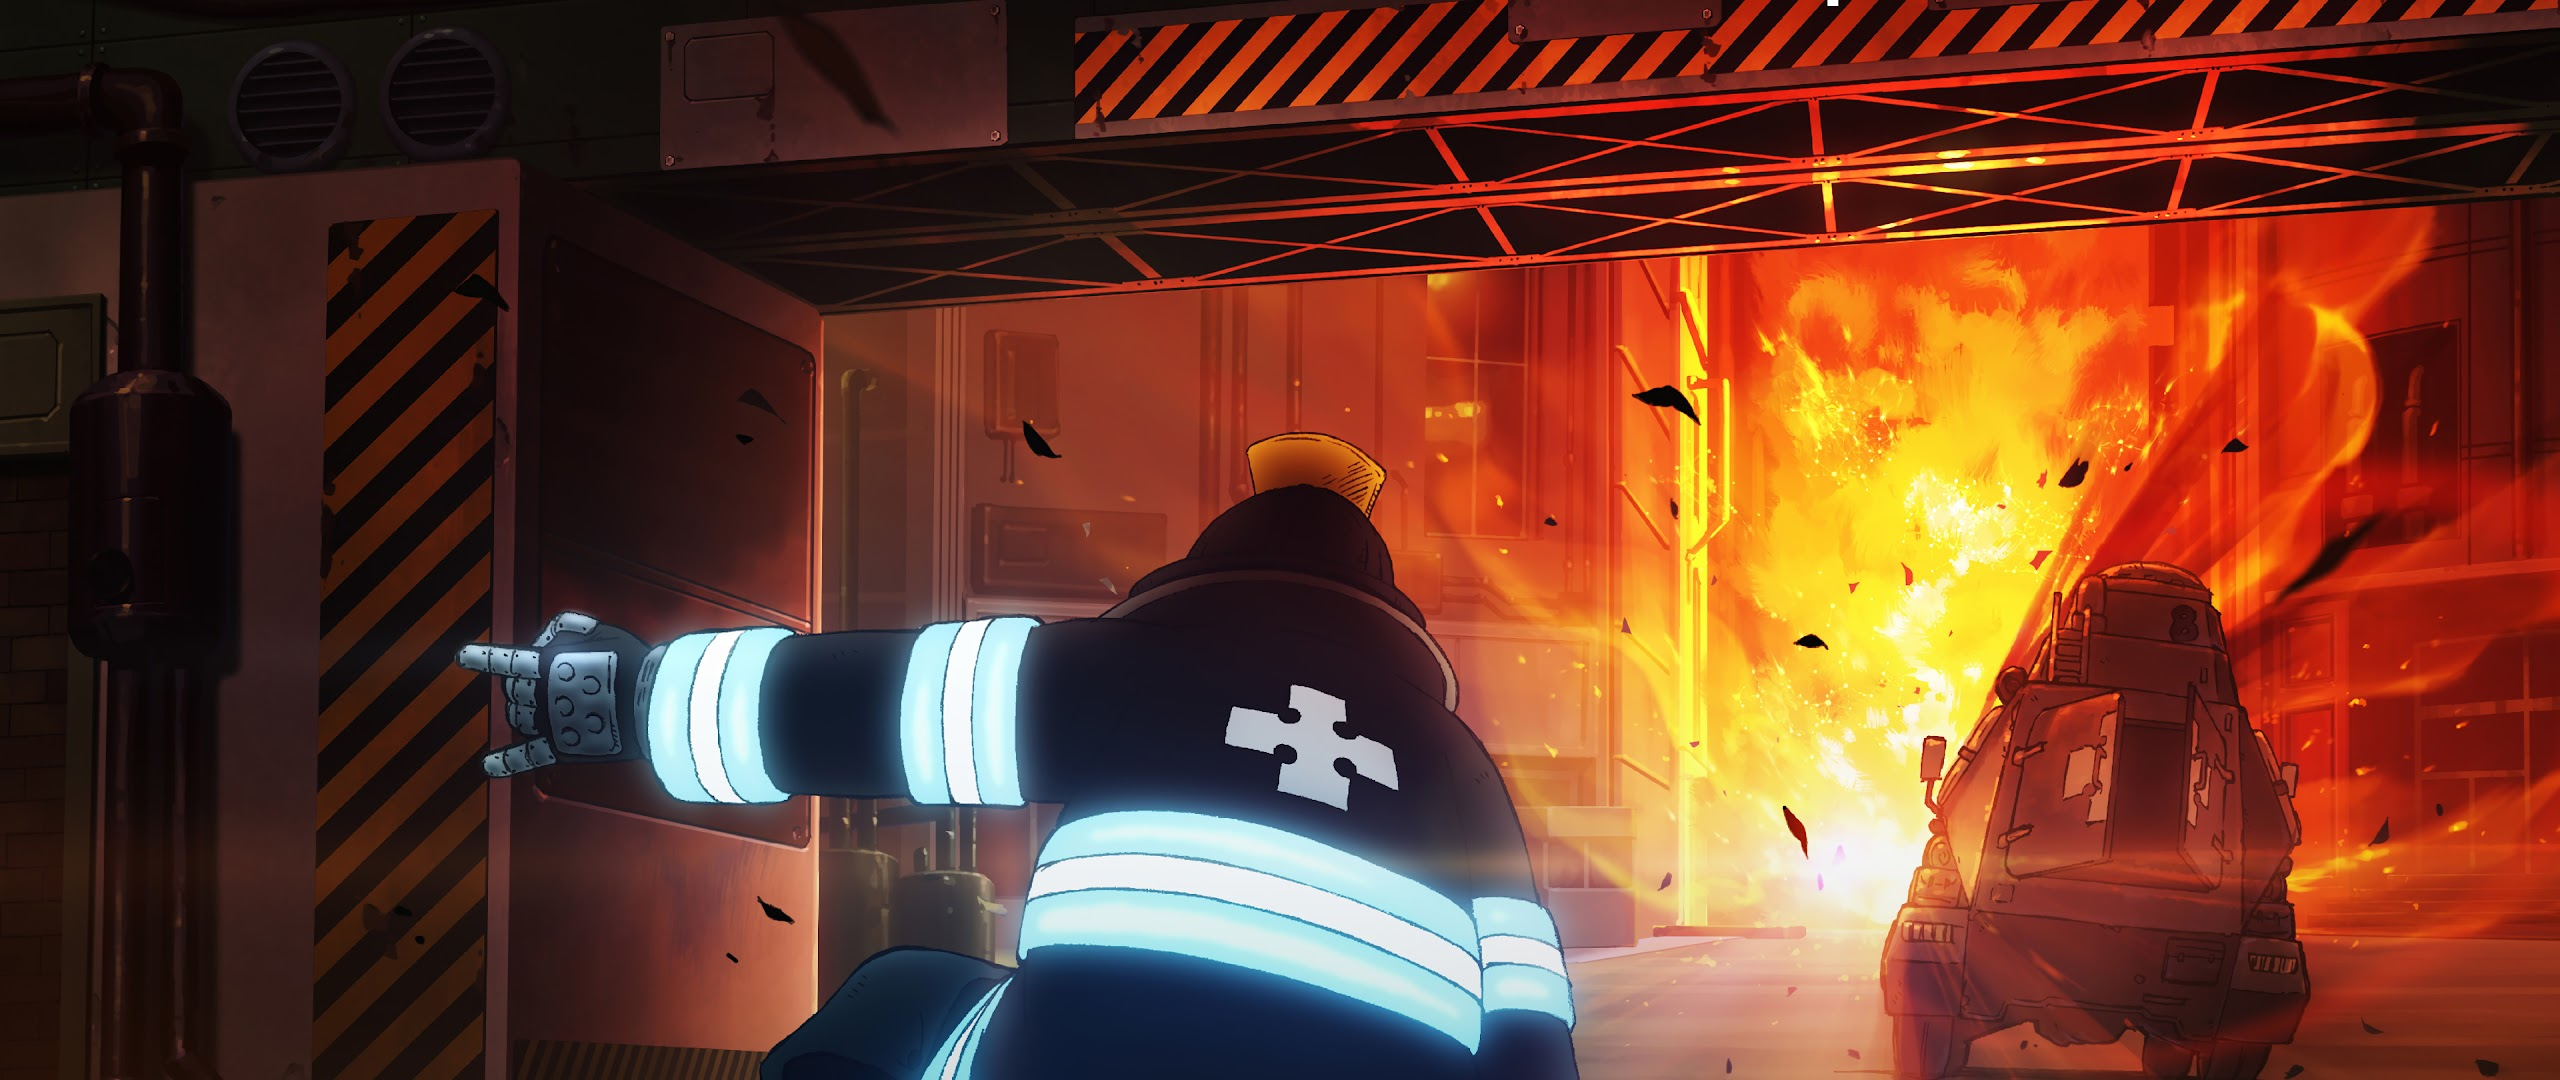 Wallpaper Smartphone Anime Fire Force Anime 4k 20 Wallpaper